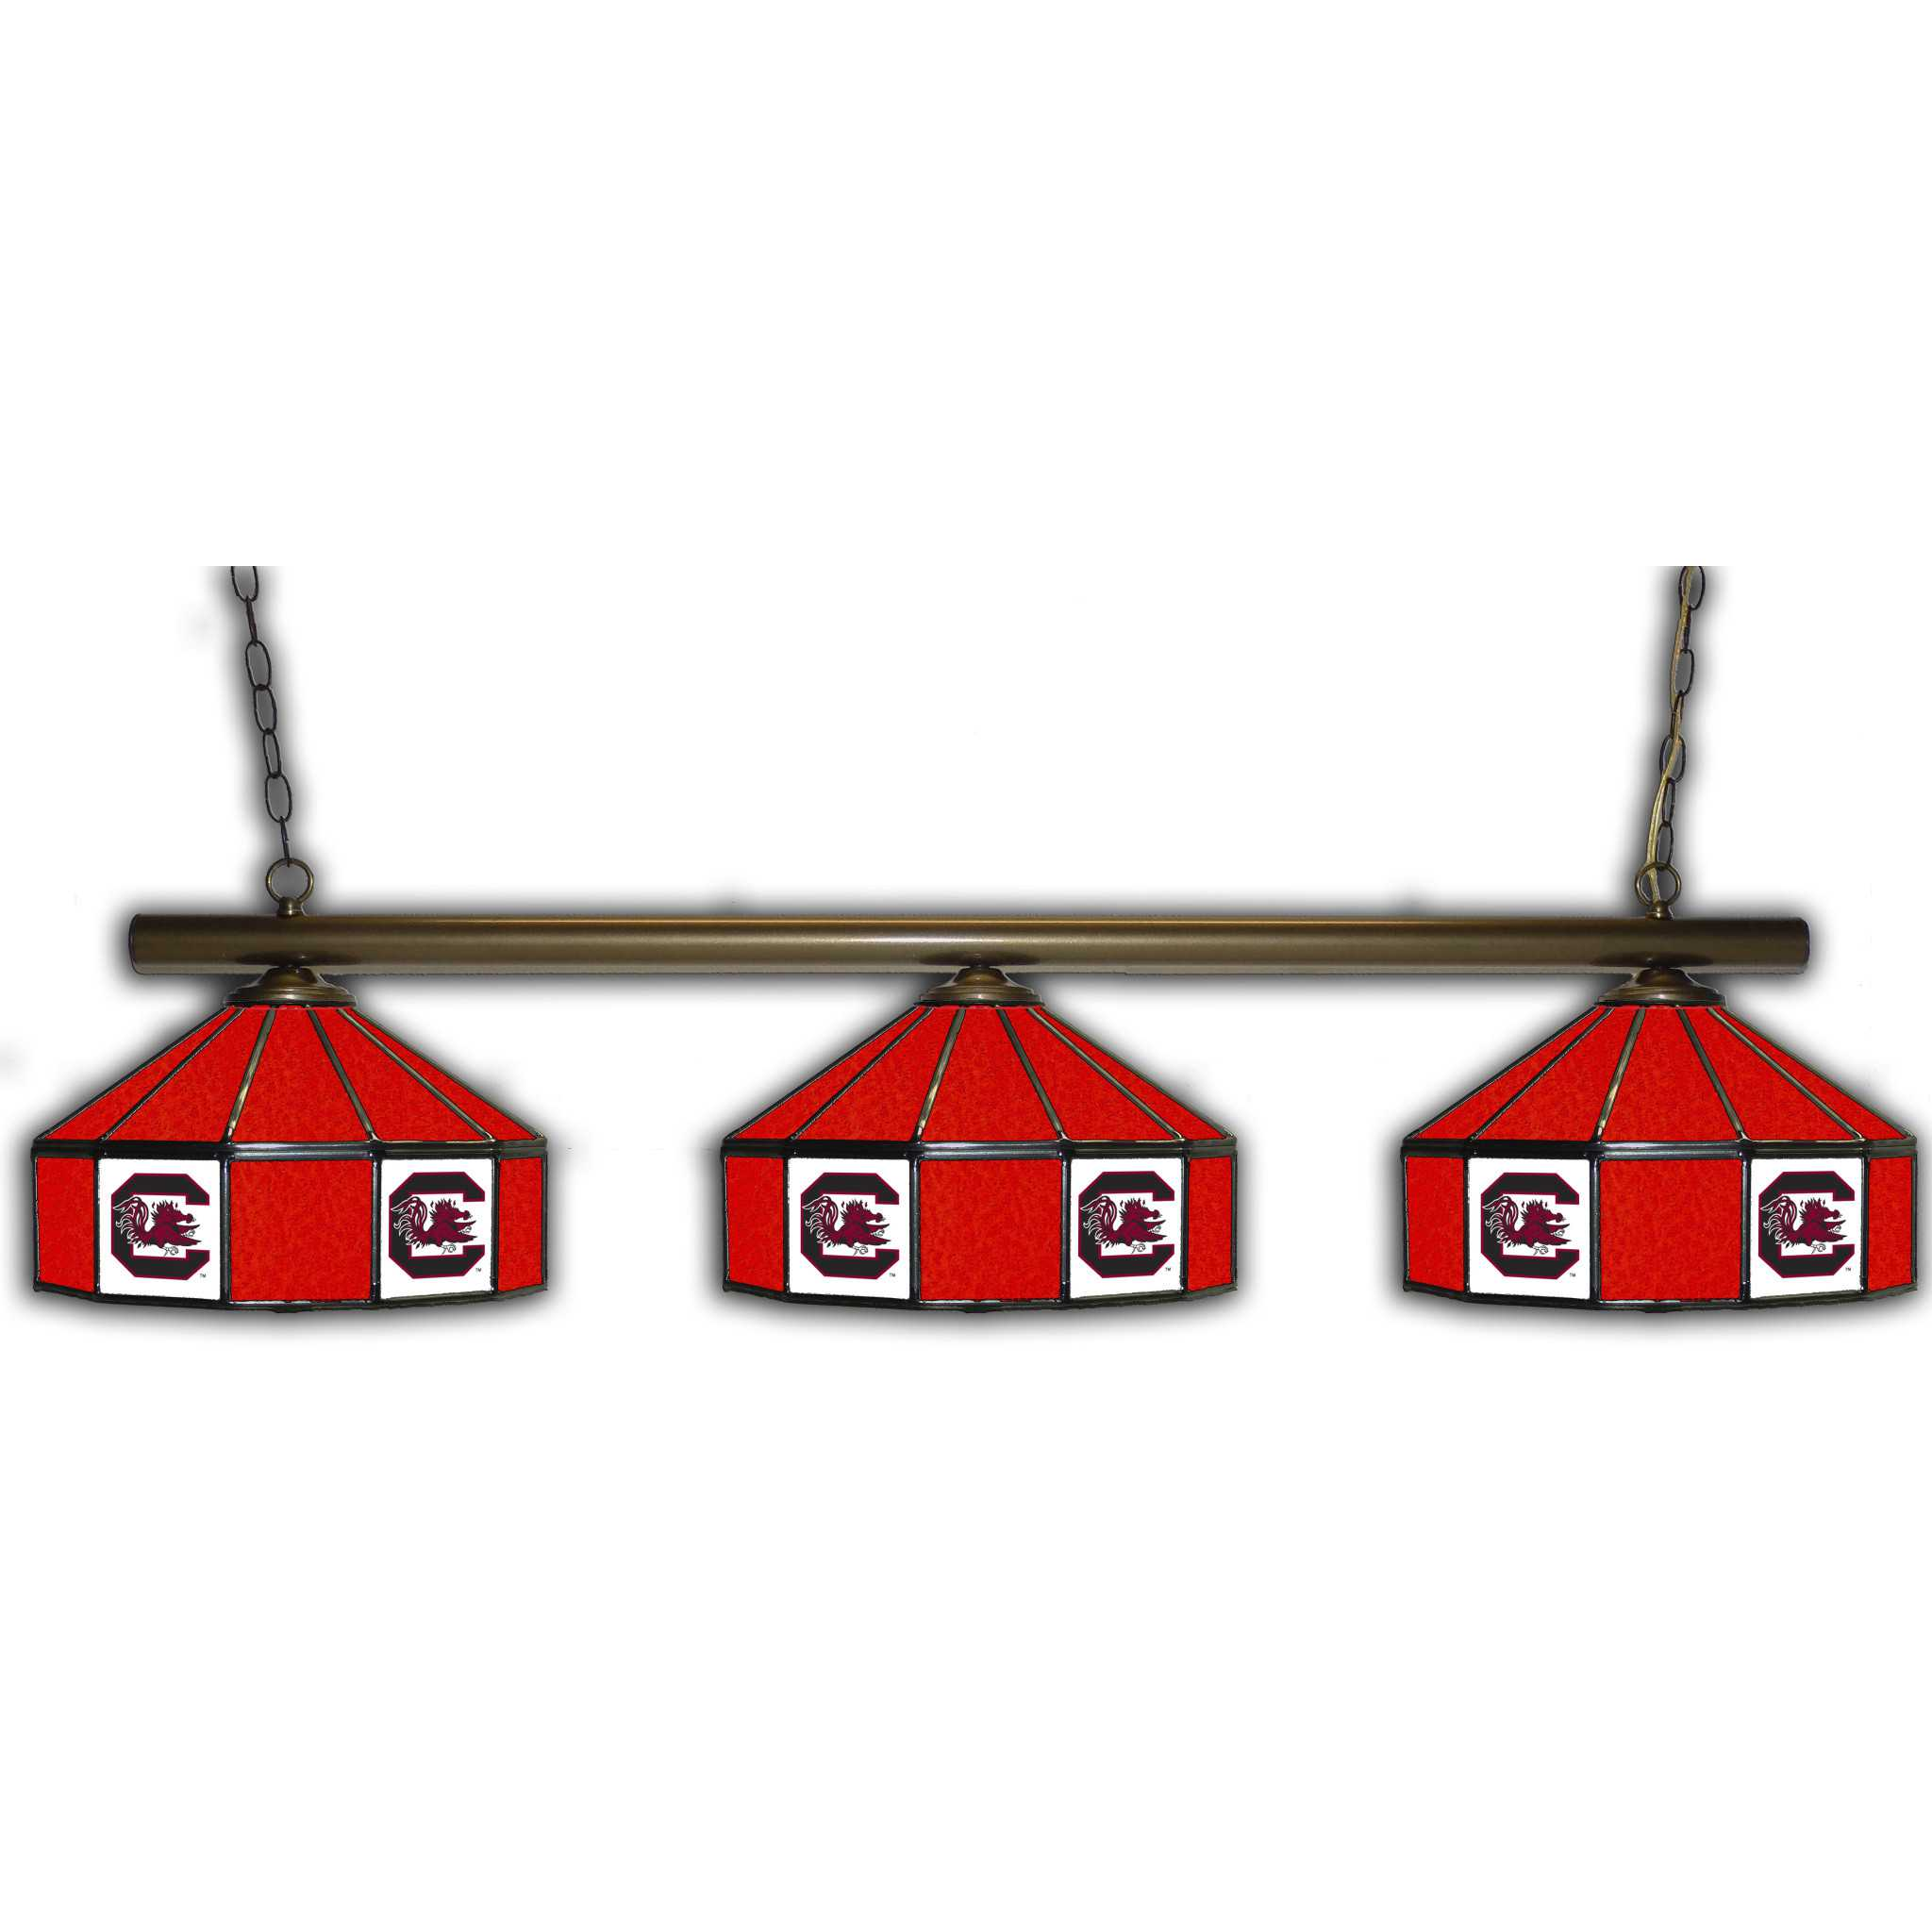 SOUTH CAROLINA GAMECOCKS 3 SHADE GLASS LAMP